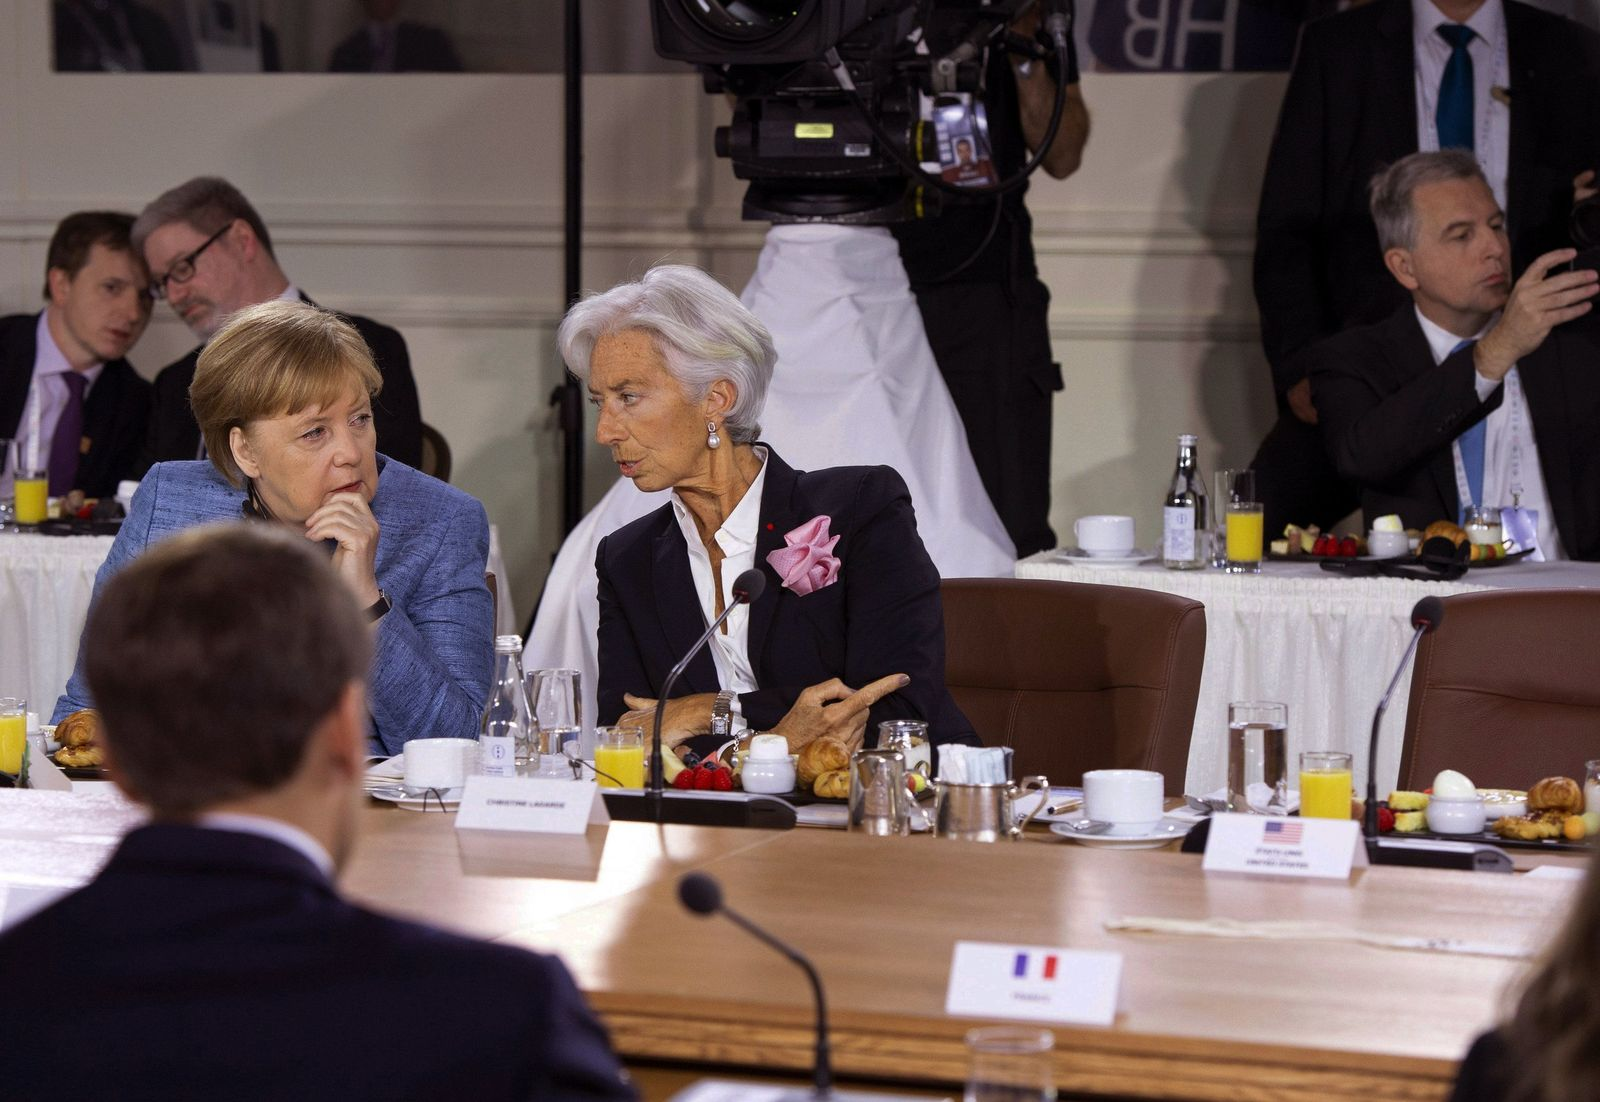 Bilanz des G7-Gipfels in Kanada